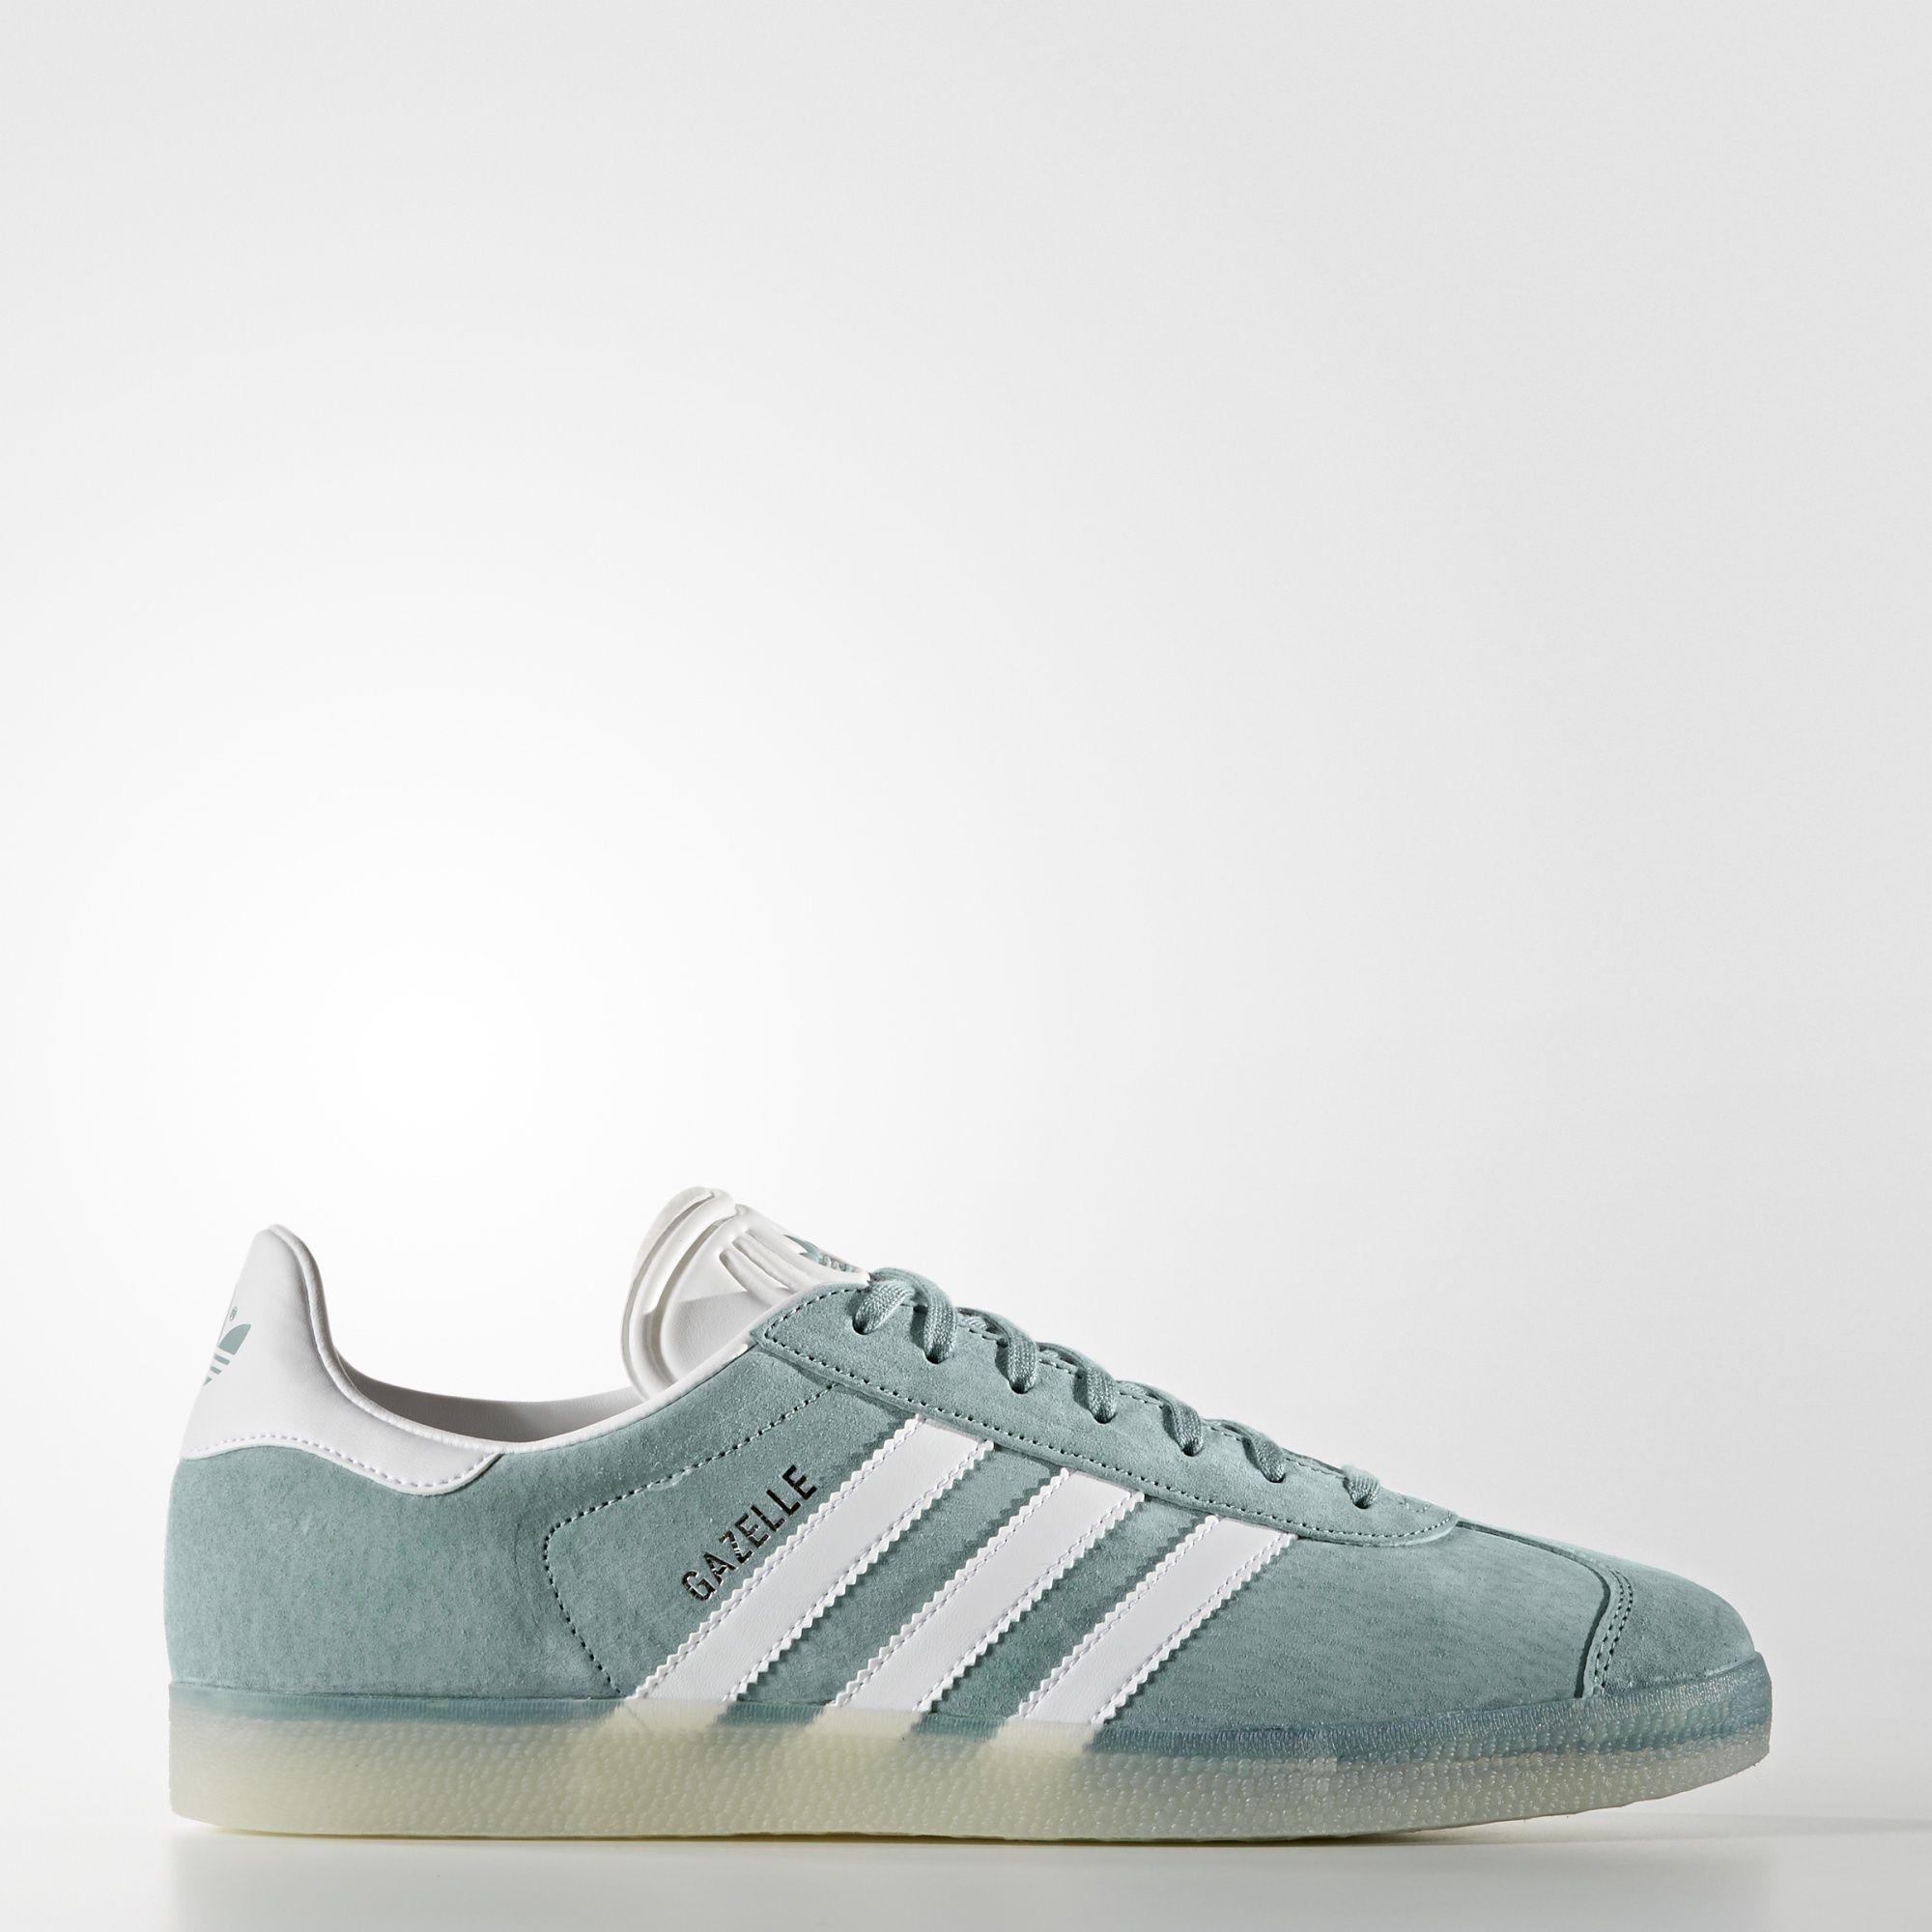 adidas Gazelle Shoes | Adidas shoes originals, Adidas gazelle